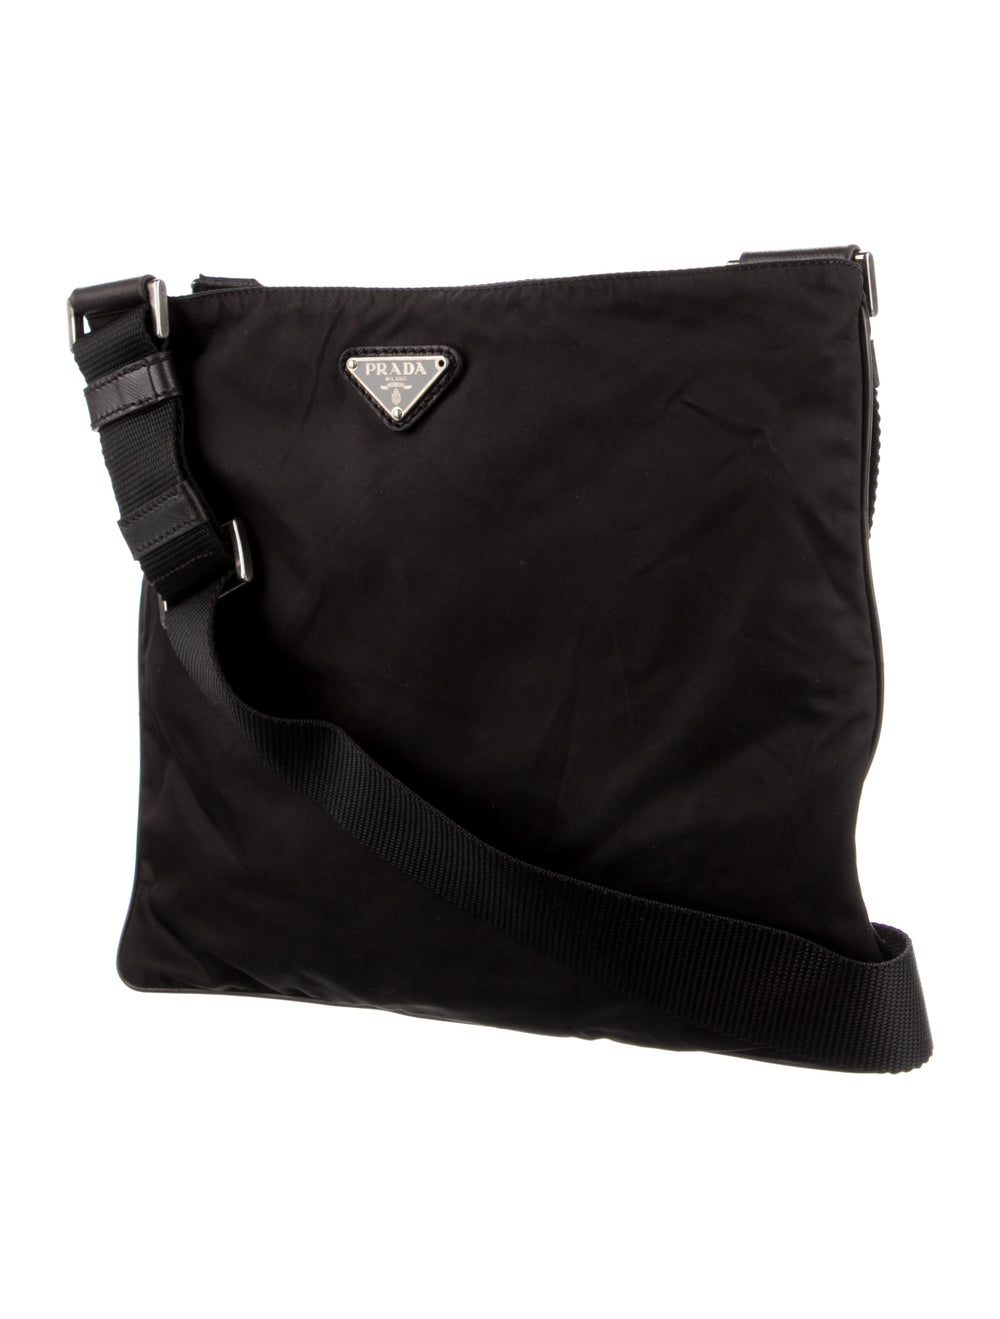 Prada Tessuto Messenger Bag Black - image 3